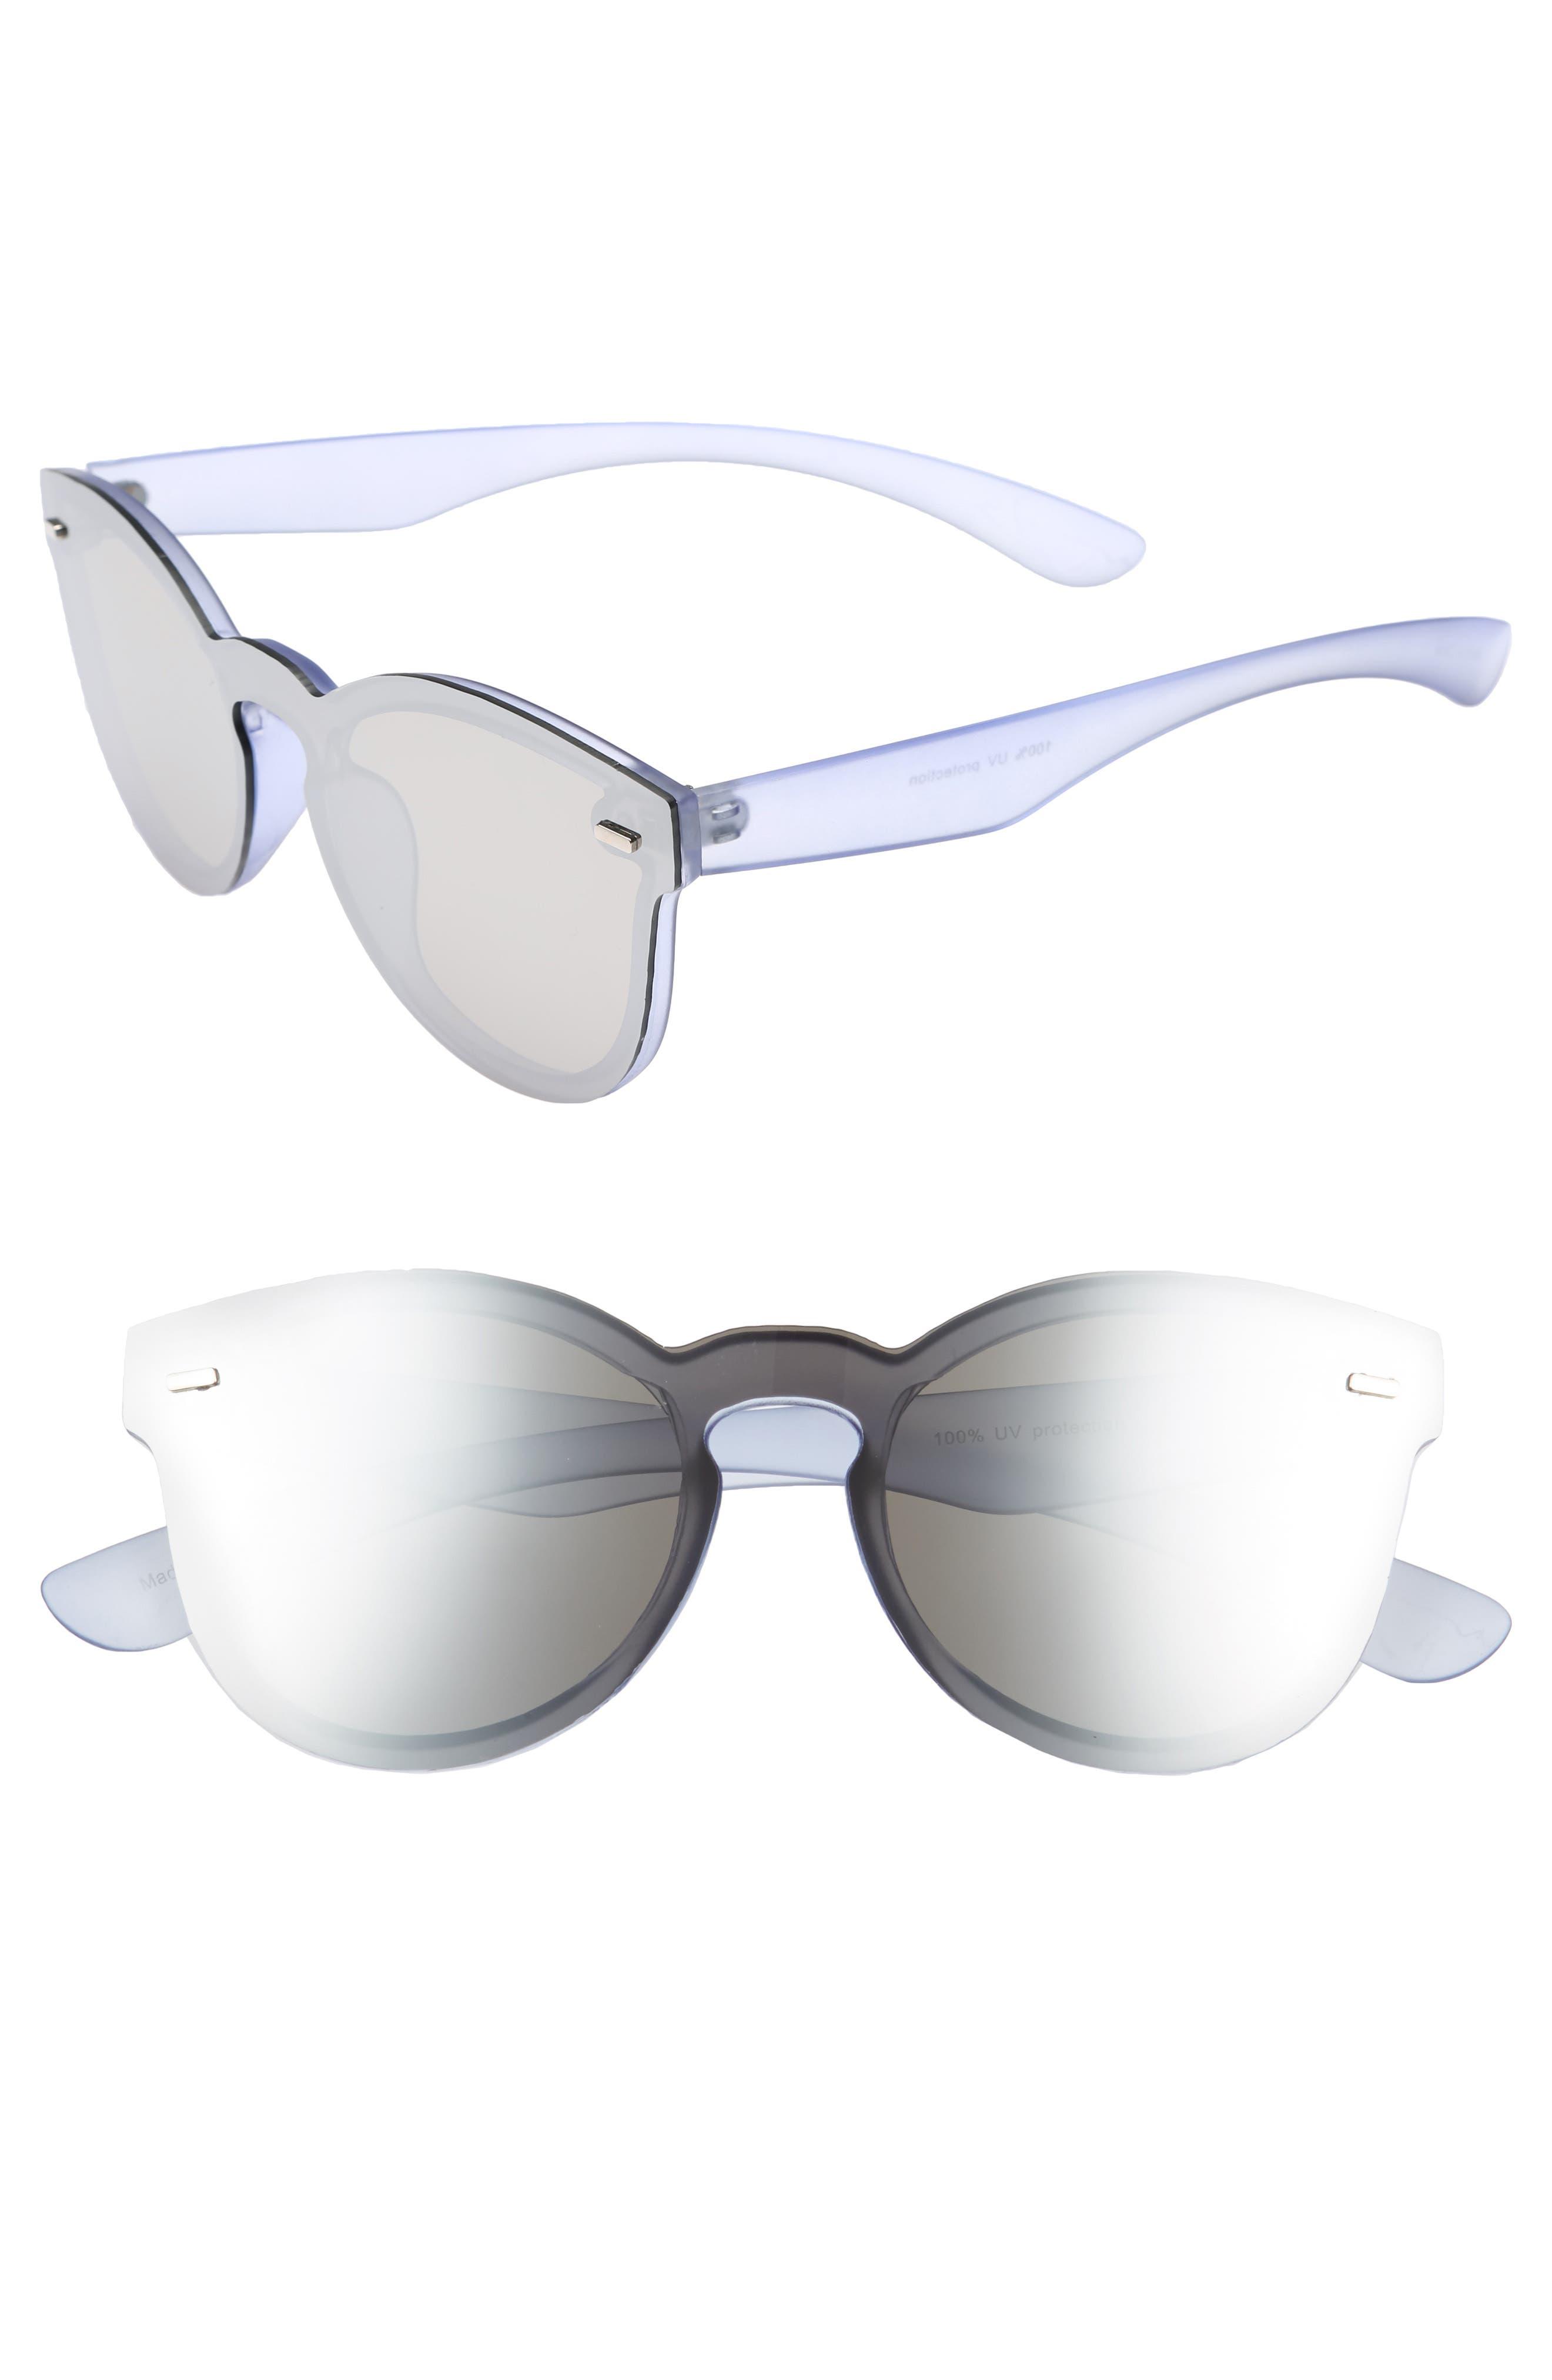 Main Image - BP. 50mm Mirrored Lens Rimless Sunglasses